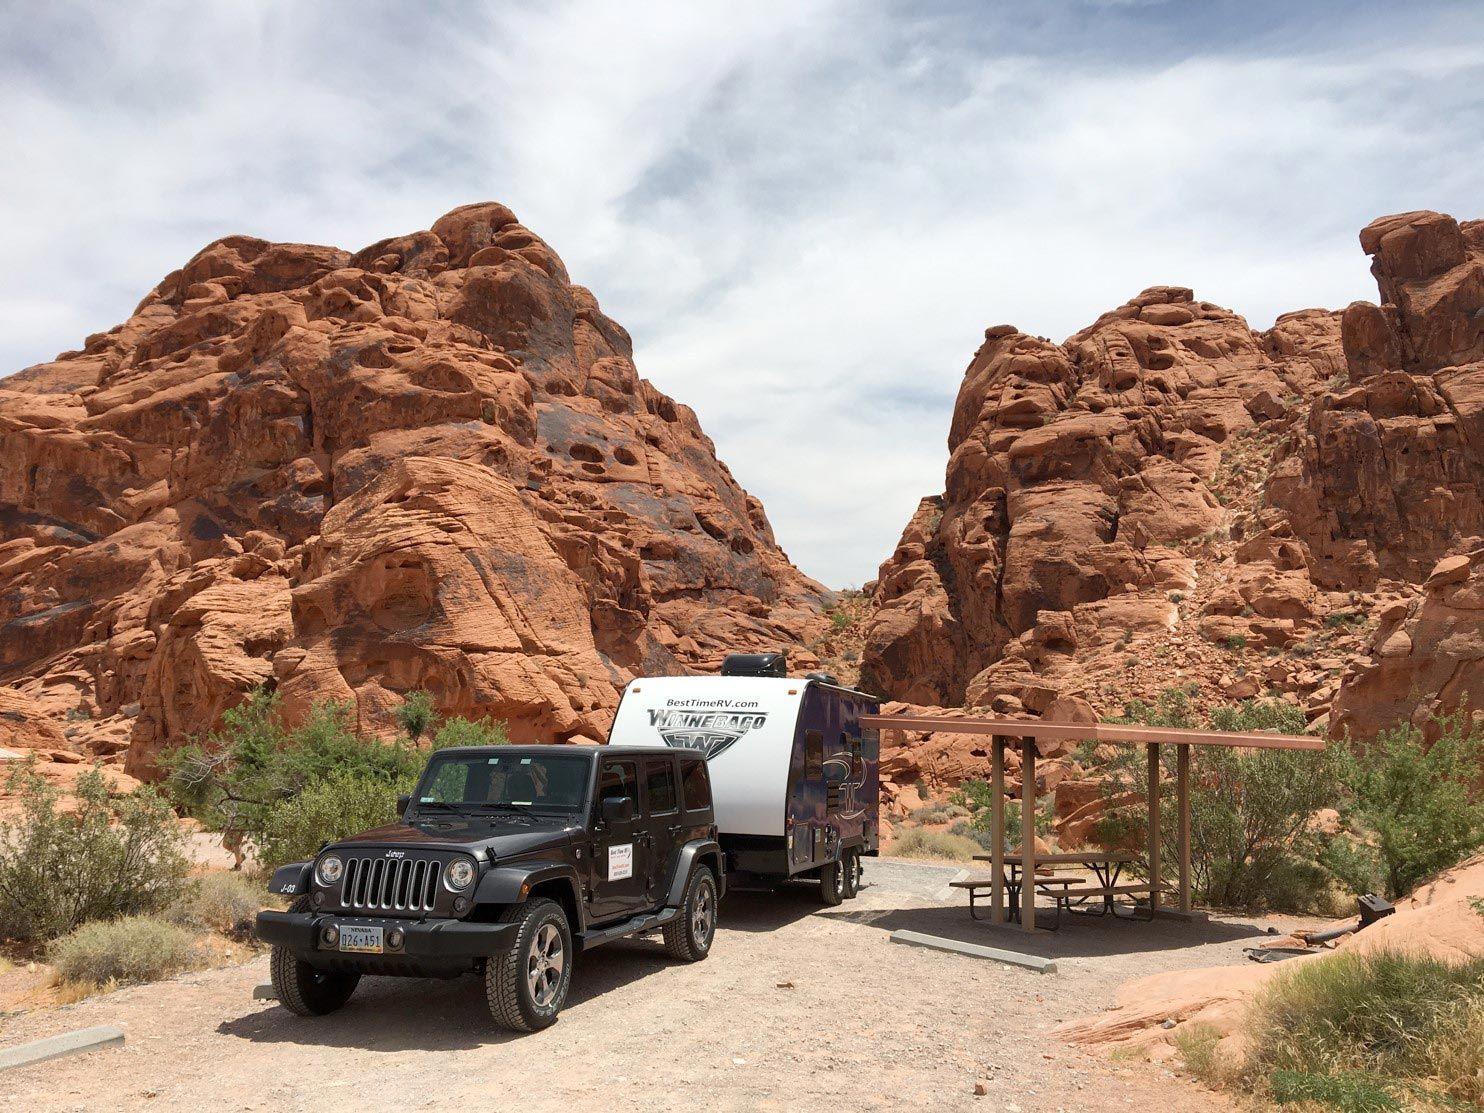 J Jeep Wrangler + Winnie Drop 170S Best Time RV 1 RV